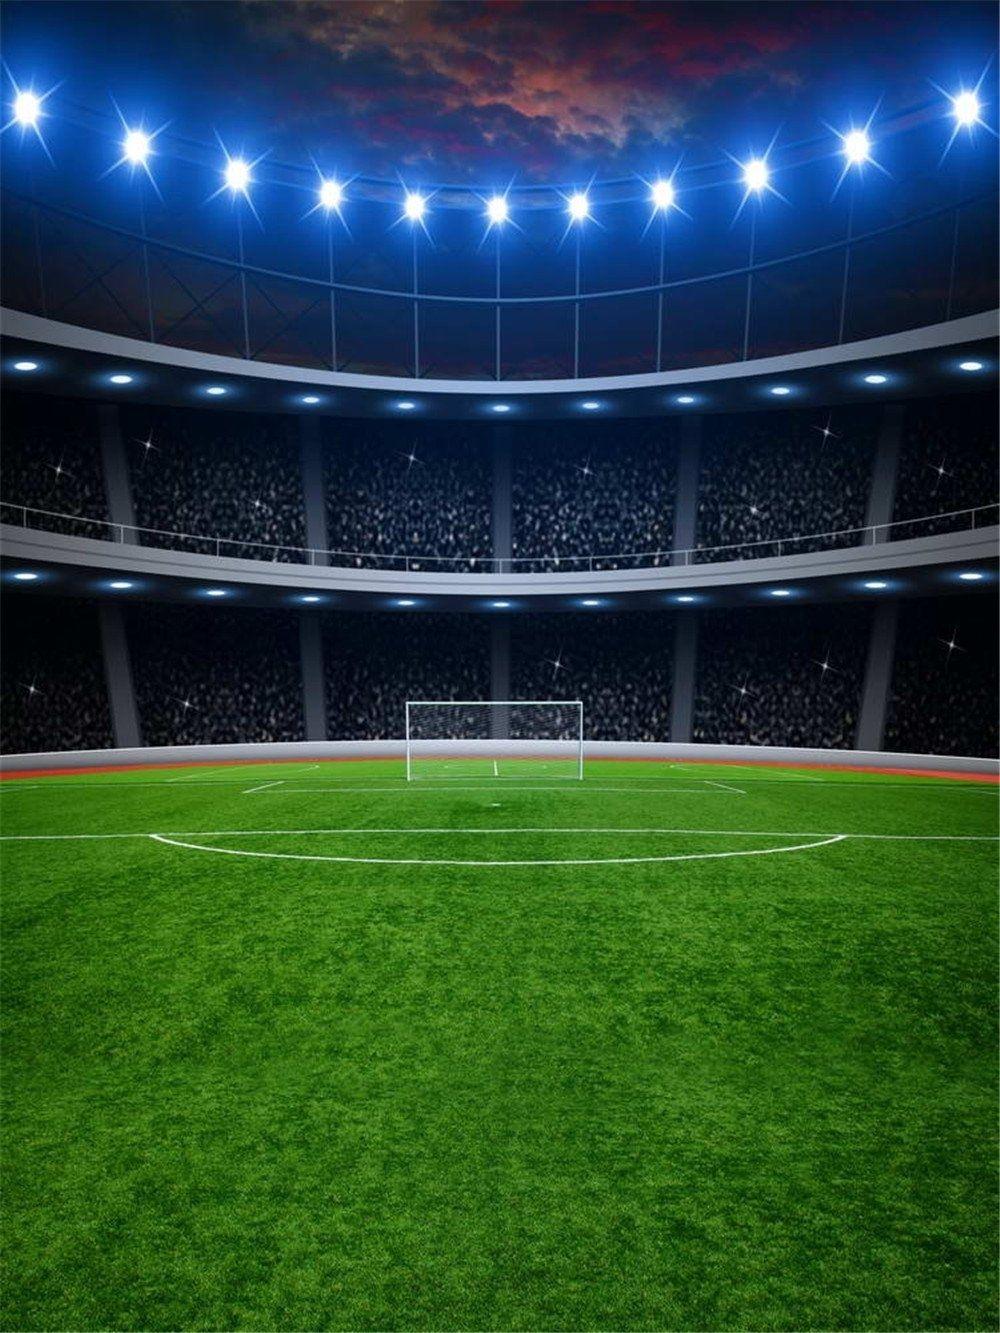 Background Sepak Bola : background, sepak, 5x7ft, Football, Field, Backgrounds, Photo, Studio, Flash, Green, Grass, Floor, Children, Photography, Backdrops, Party, Sport, Props, Lapangan, Sepak, Bola,, Gambar